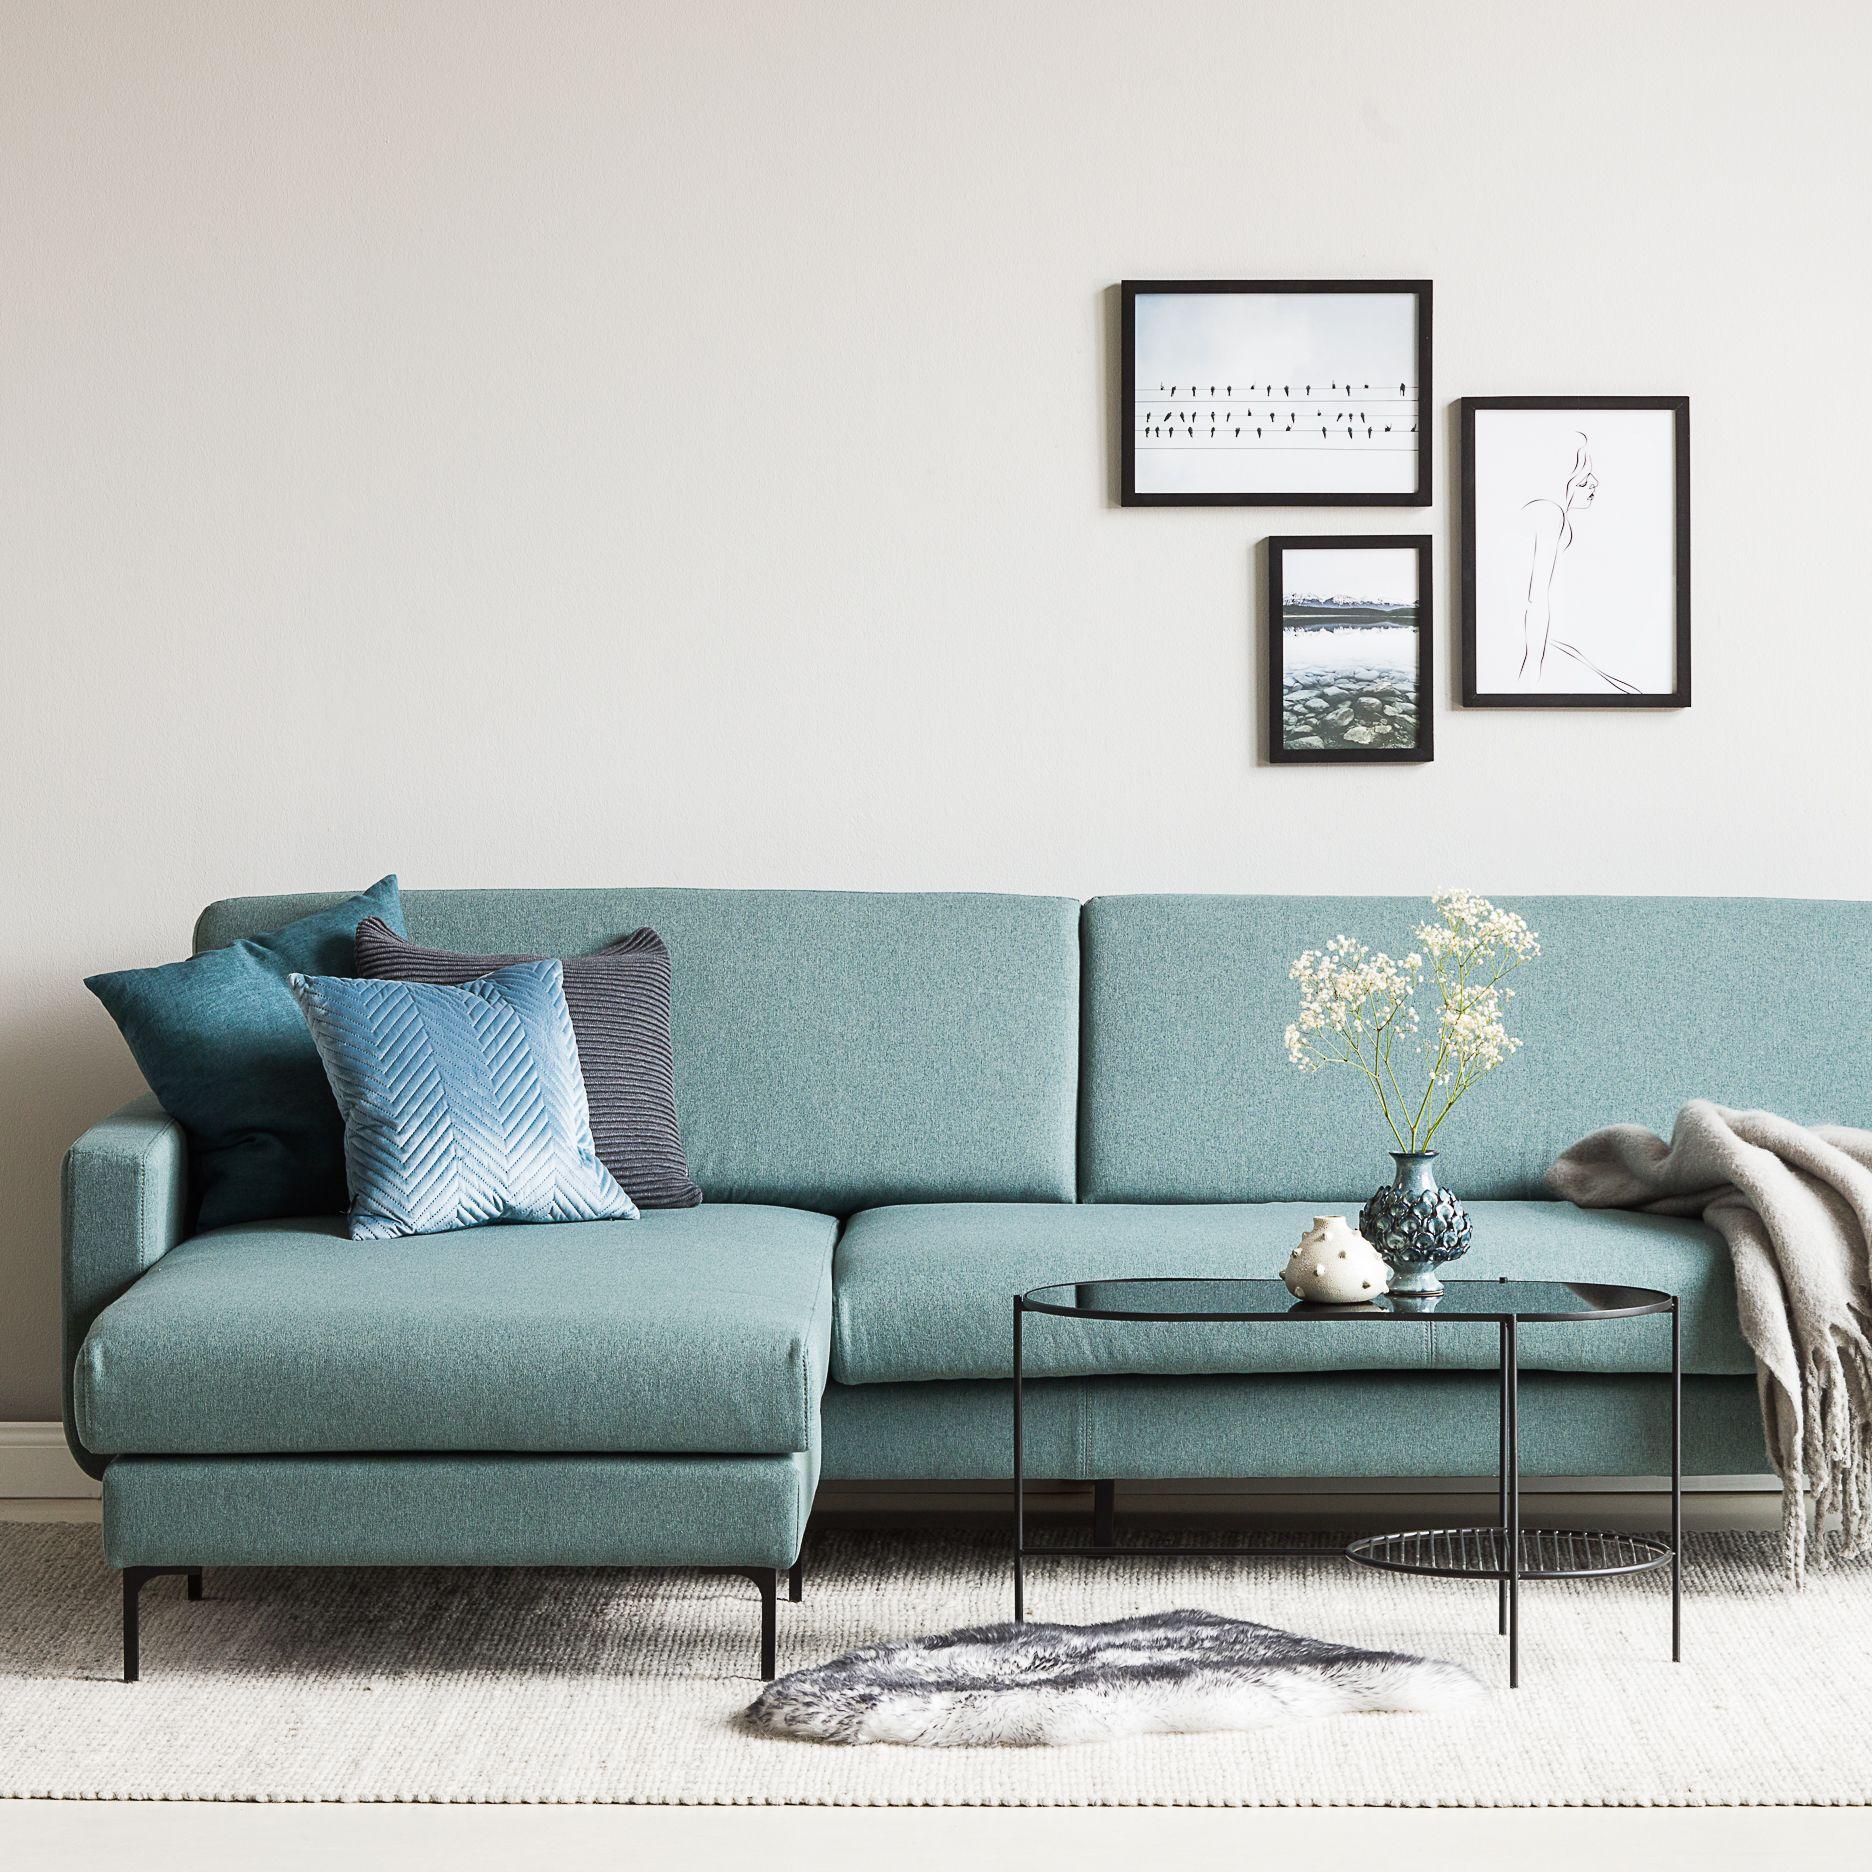 RICHMOND chaiselong sofa blå | Boligindretning, Sofa ideer